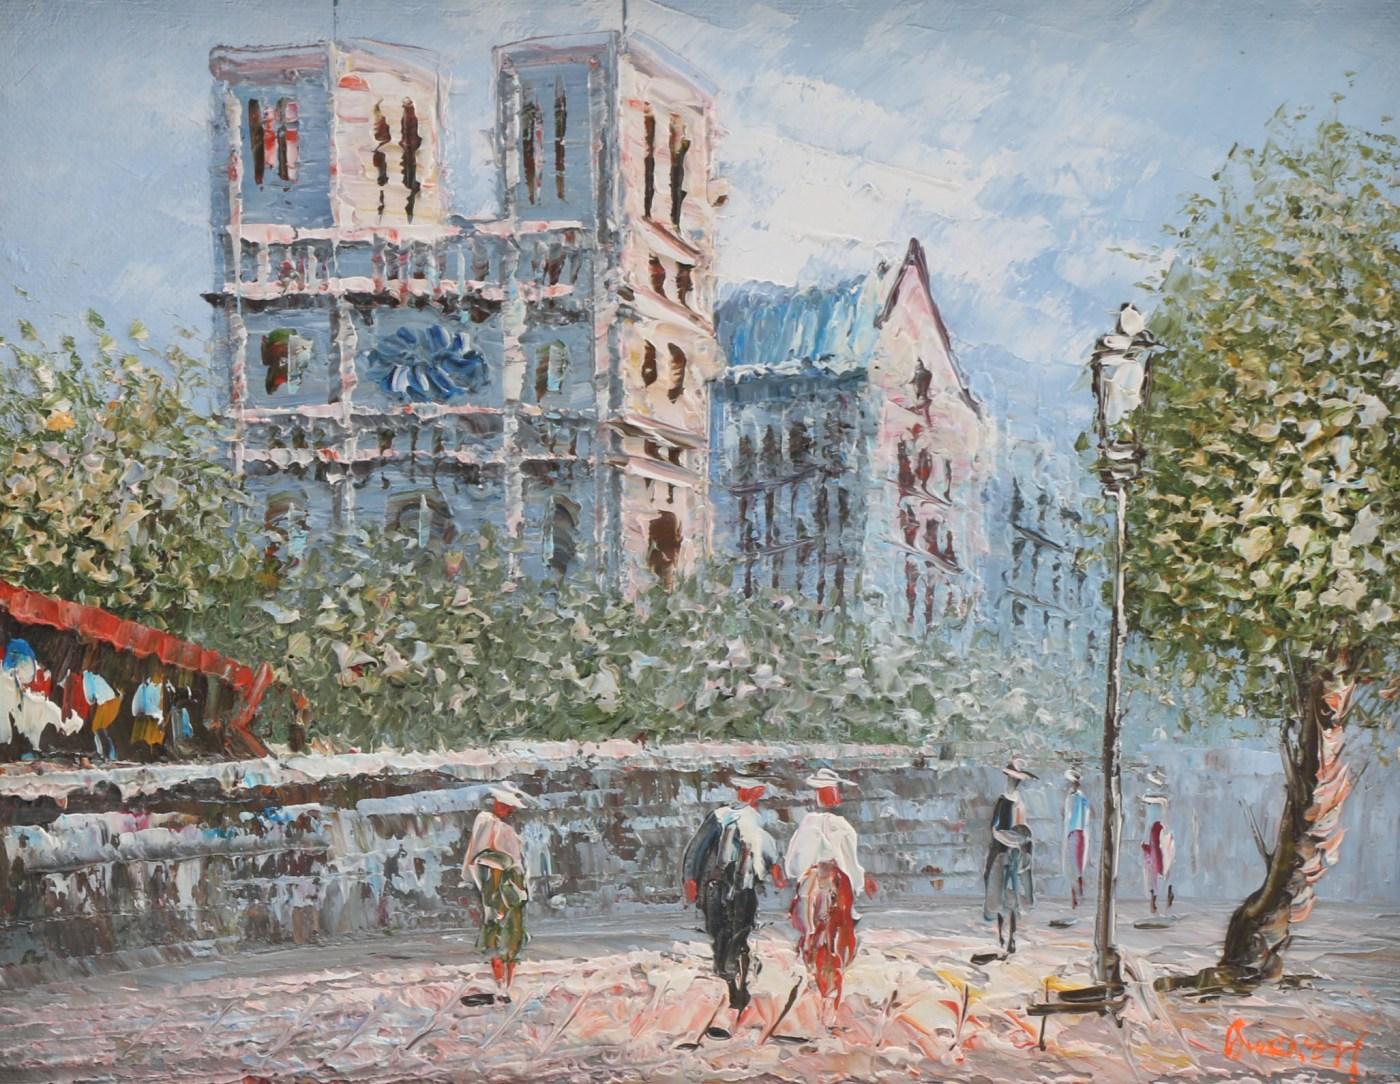 Burnett Impressionist Painting Of Paris Ebth - Year of Clean